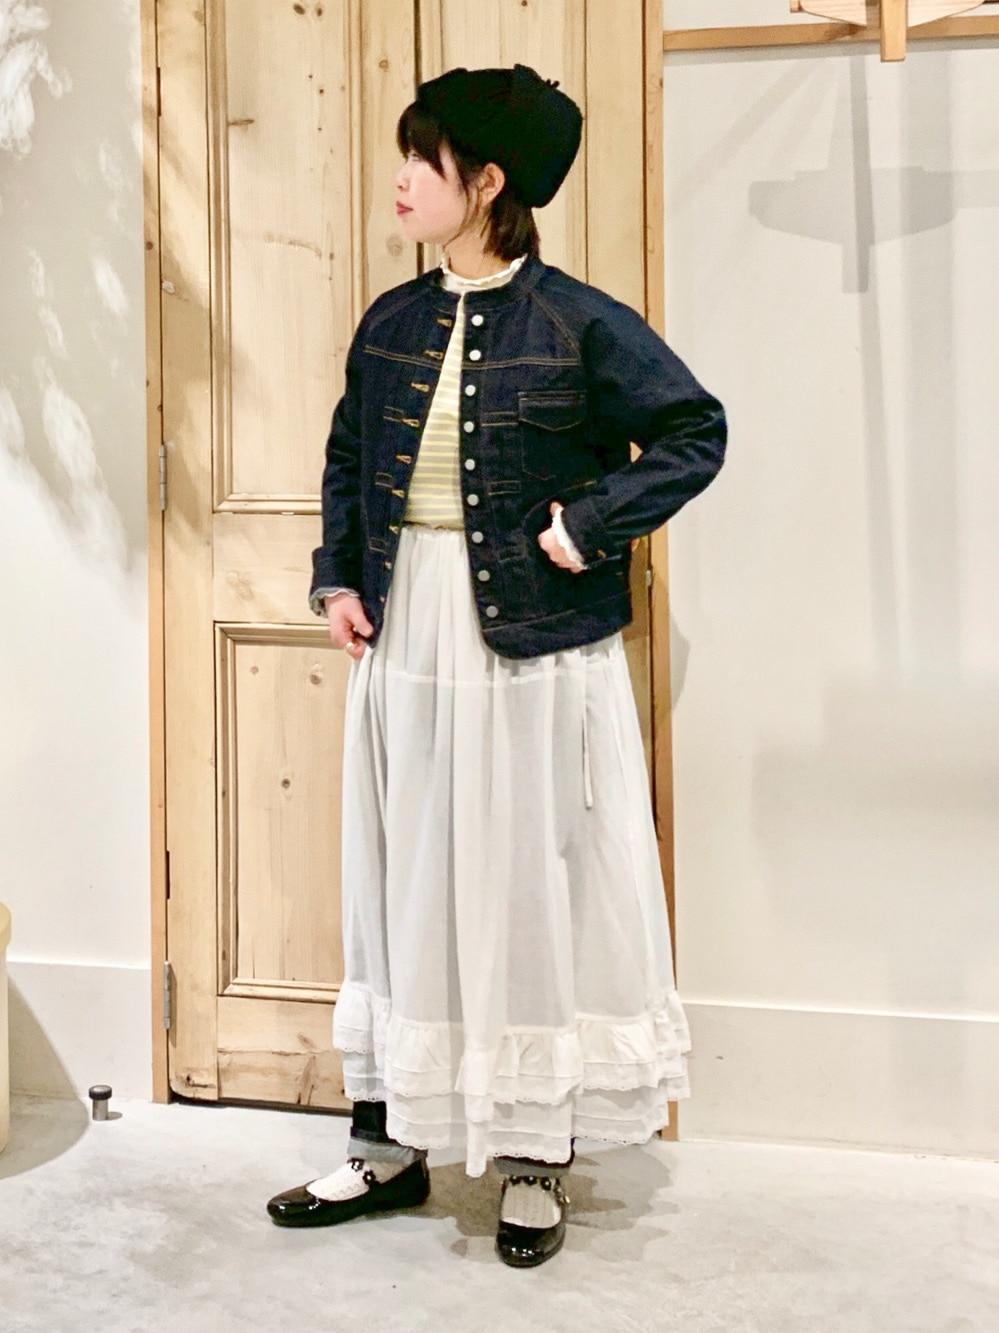 Malle chambre de charme 調布パルコ 身長:153cm 2021.01.15